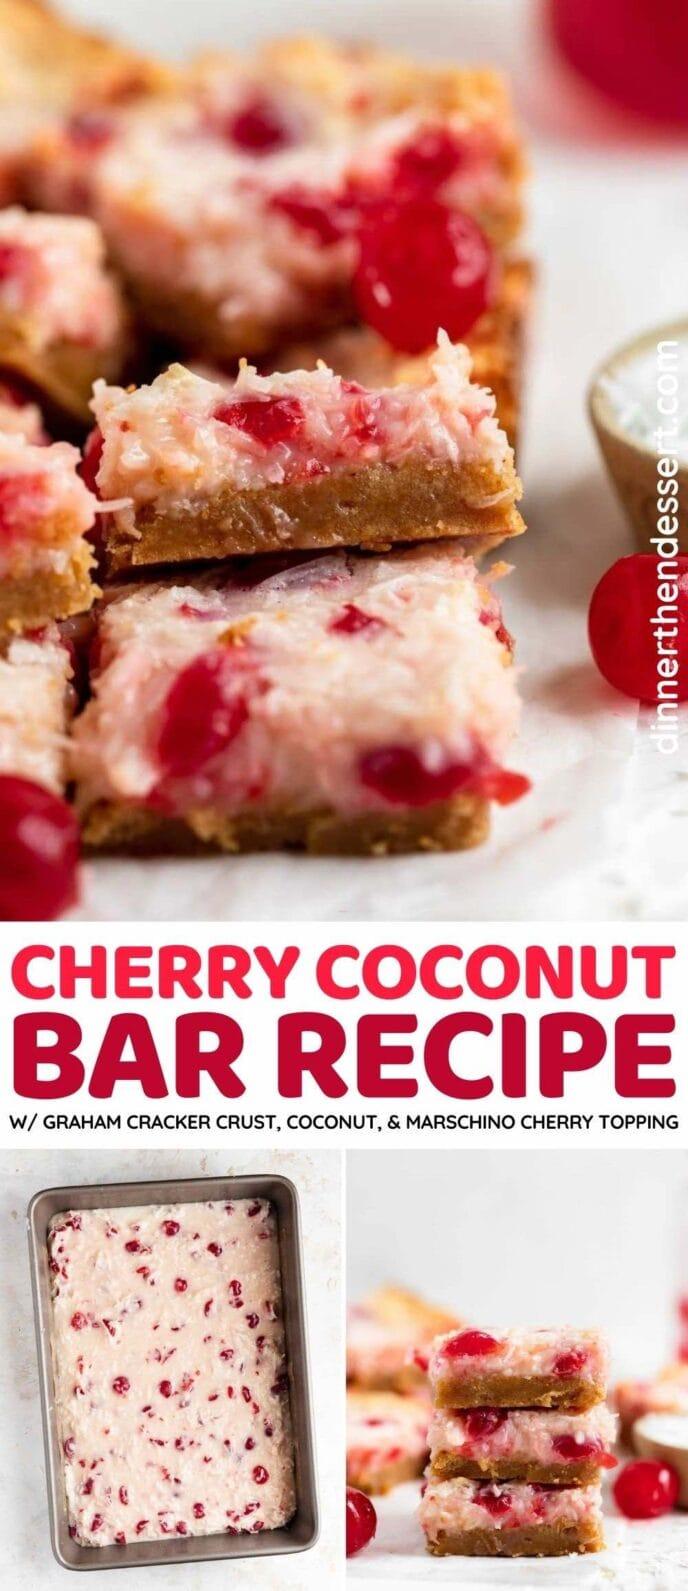 Cherry Coconut Bars collage